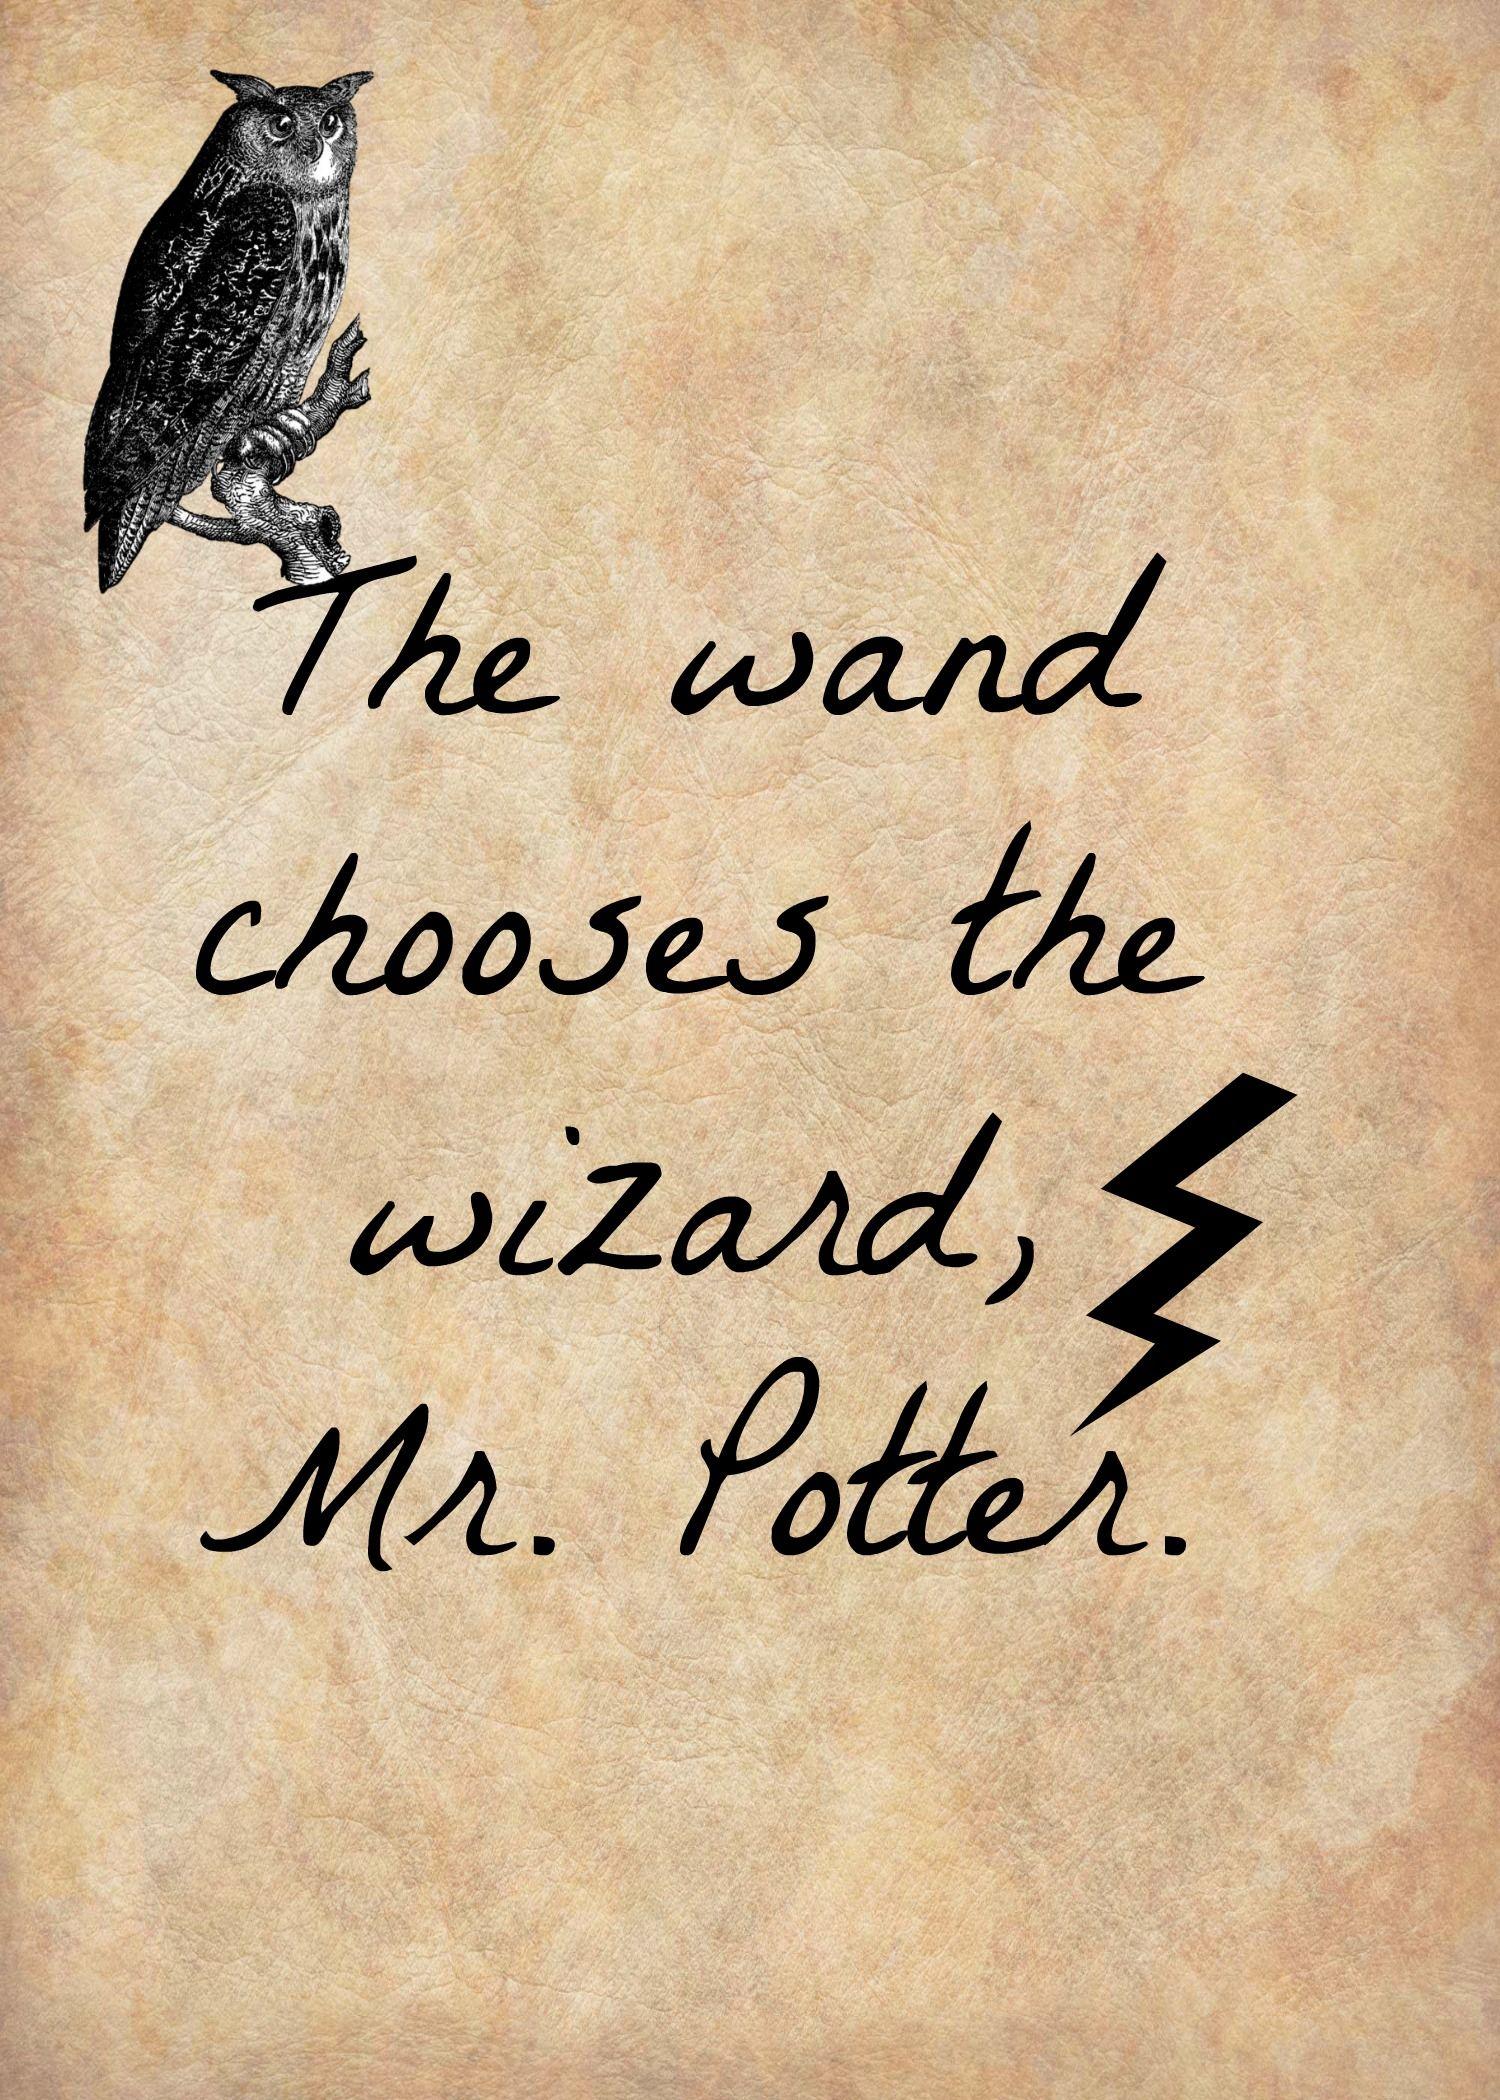 Fantastic Wallpaper Harry Potter Letter - b5139295d80c225aaec3658d996f2059  Collection_489680.jpg